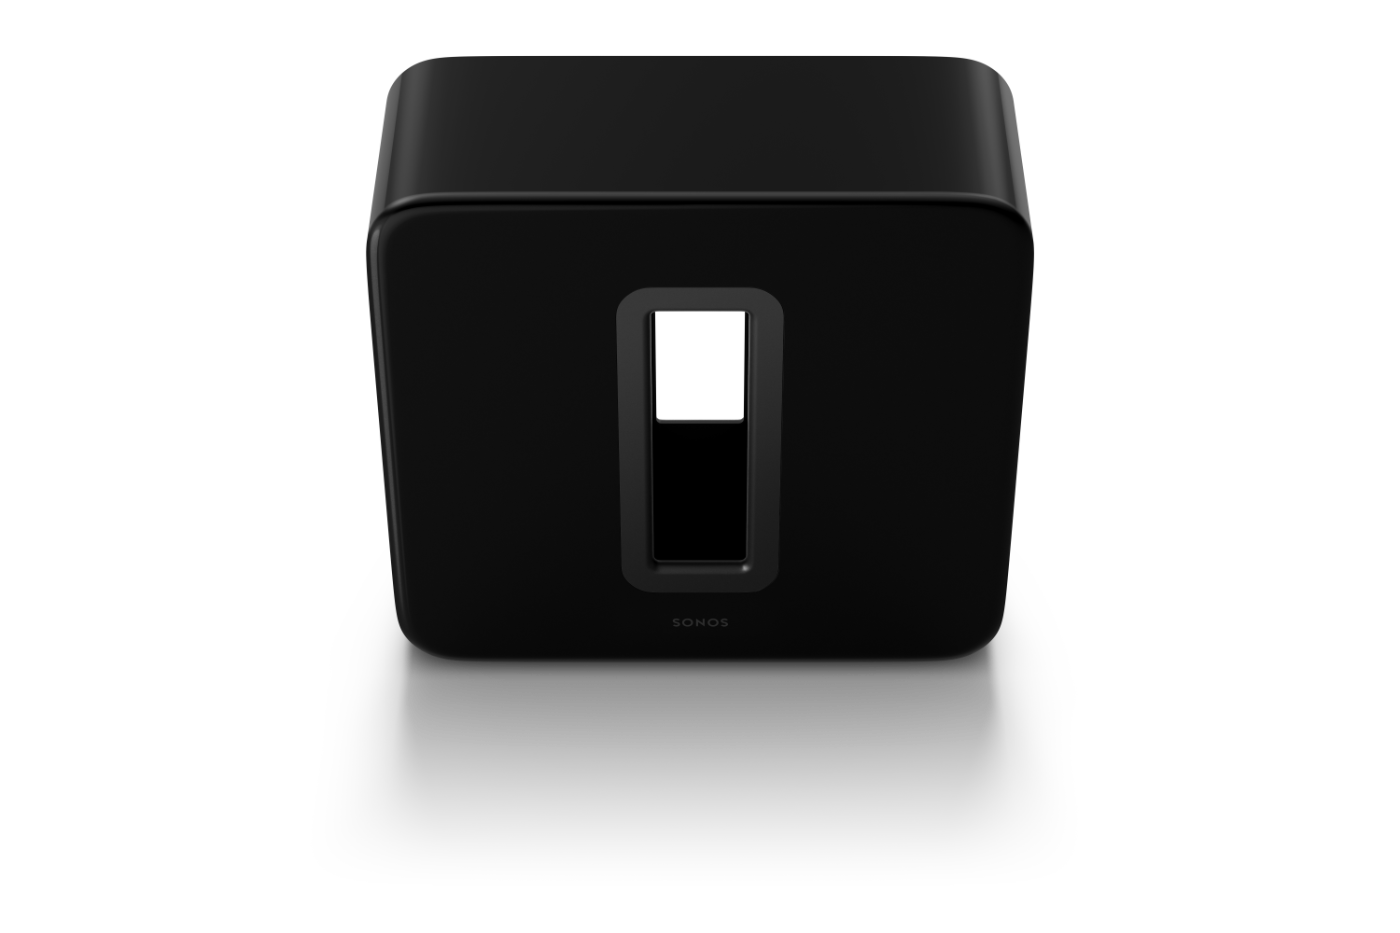 Sub_Gen_2_Black-Product_render-Hero-Q3FY19_Brilliant_Sound_Core_Creative_MST-MST_fid31857